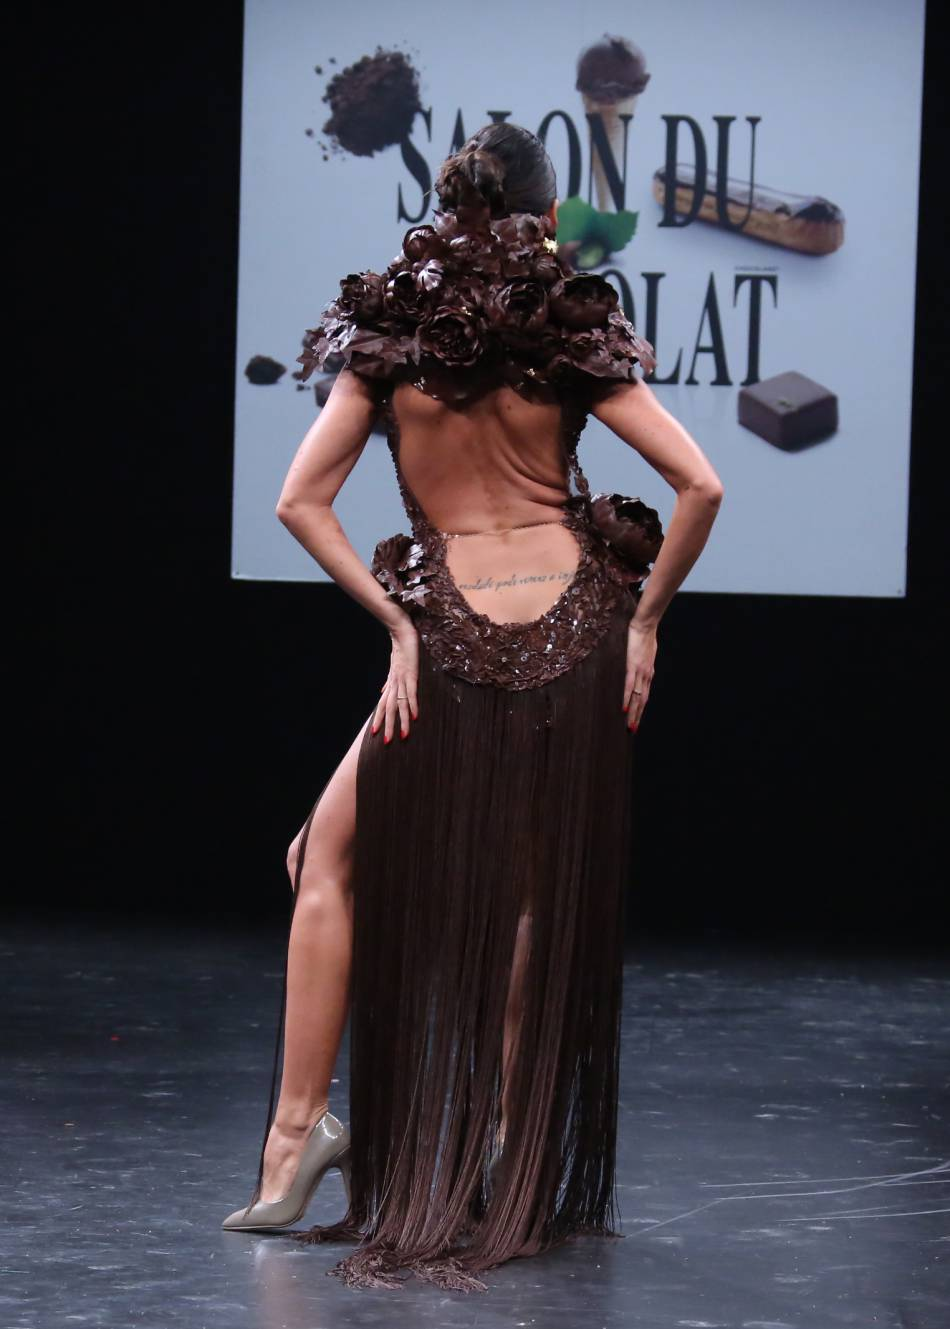 Karine Lima vue de derrière. Chaud Cacao - Chaud, chaud, chaud, chocolat !